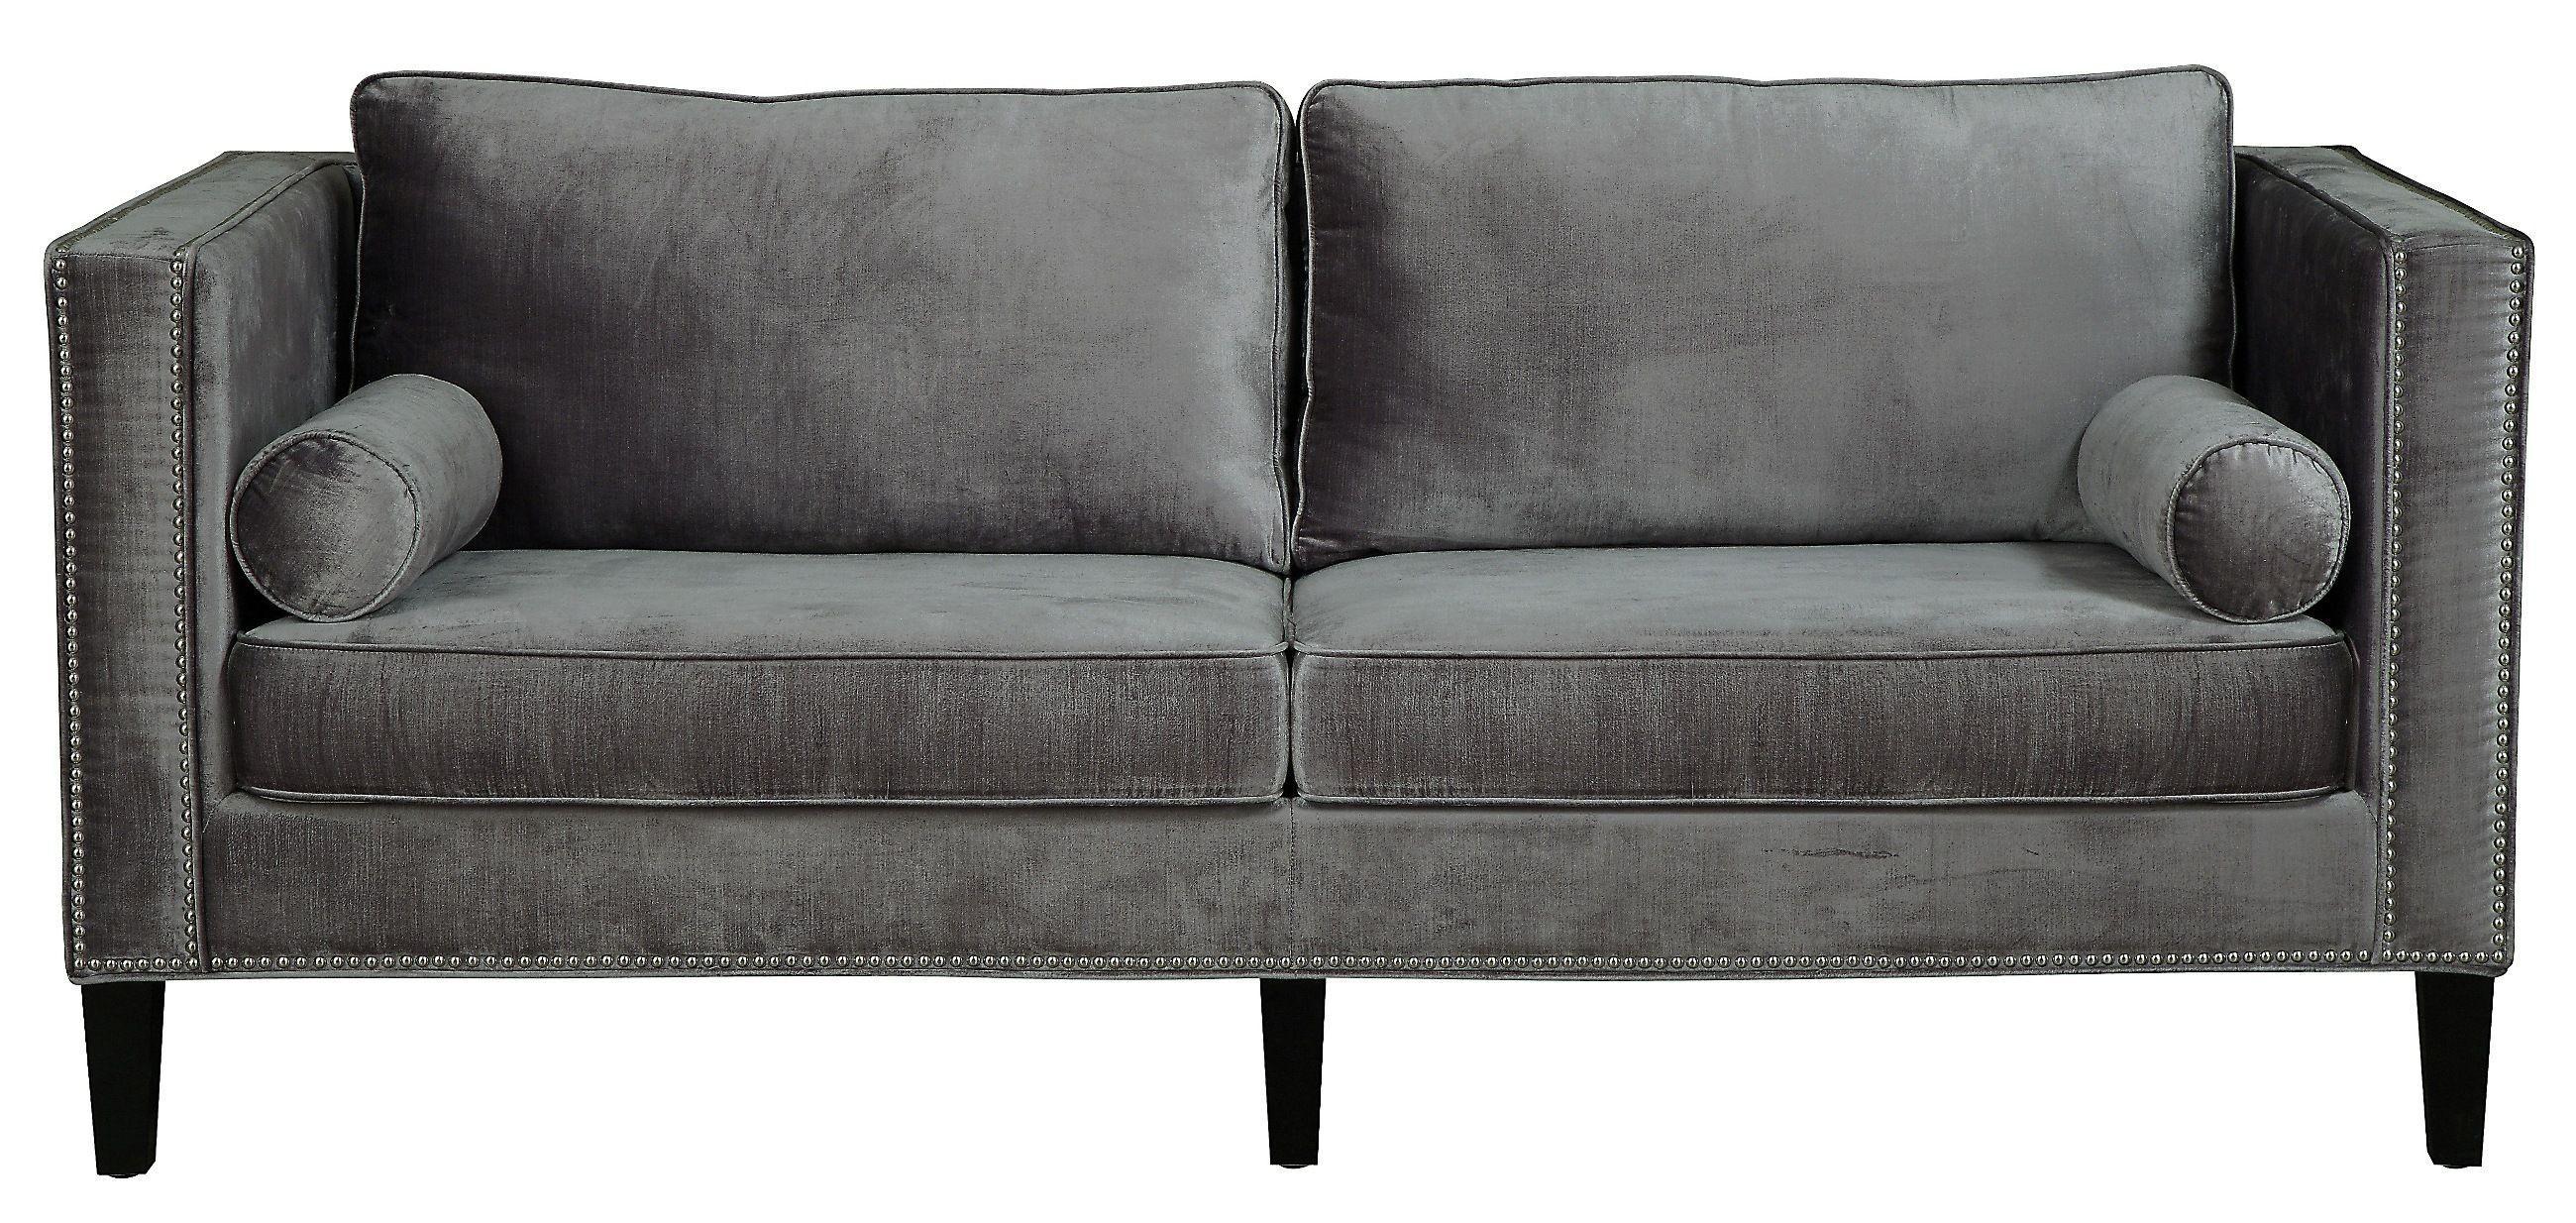 Furniture: Grey Velvet Sofa | Grey Tufted Sofa | Tufted Sleeper Sofa Pertaining To Cheap Tufted Sofas (Image 6 of 23)